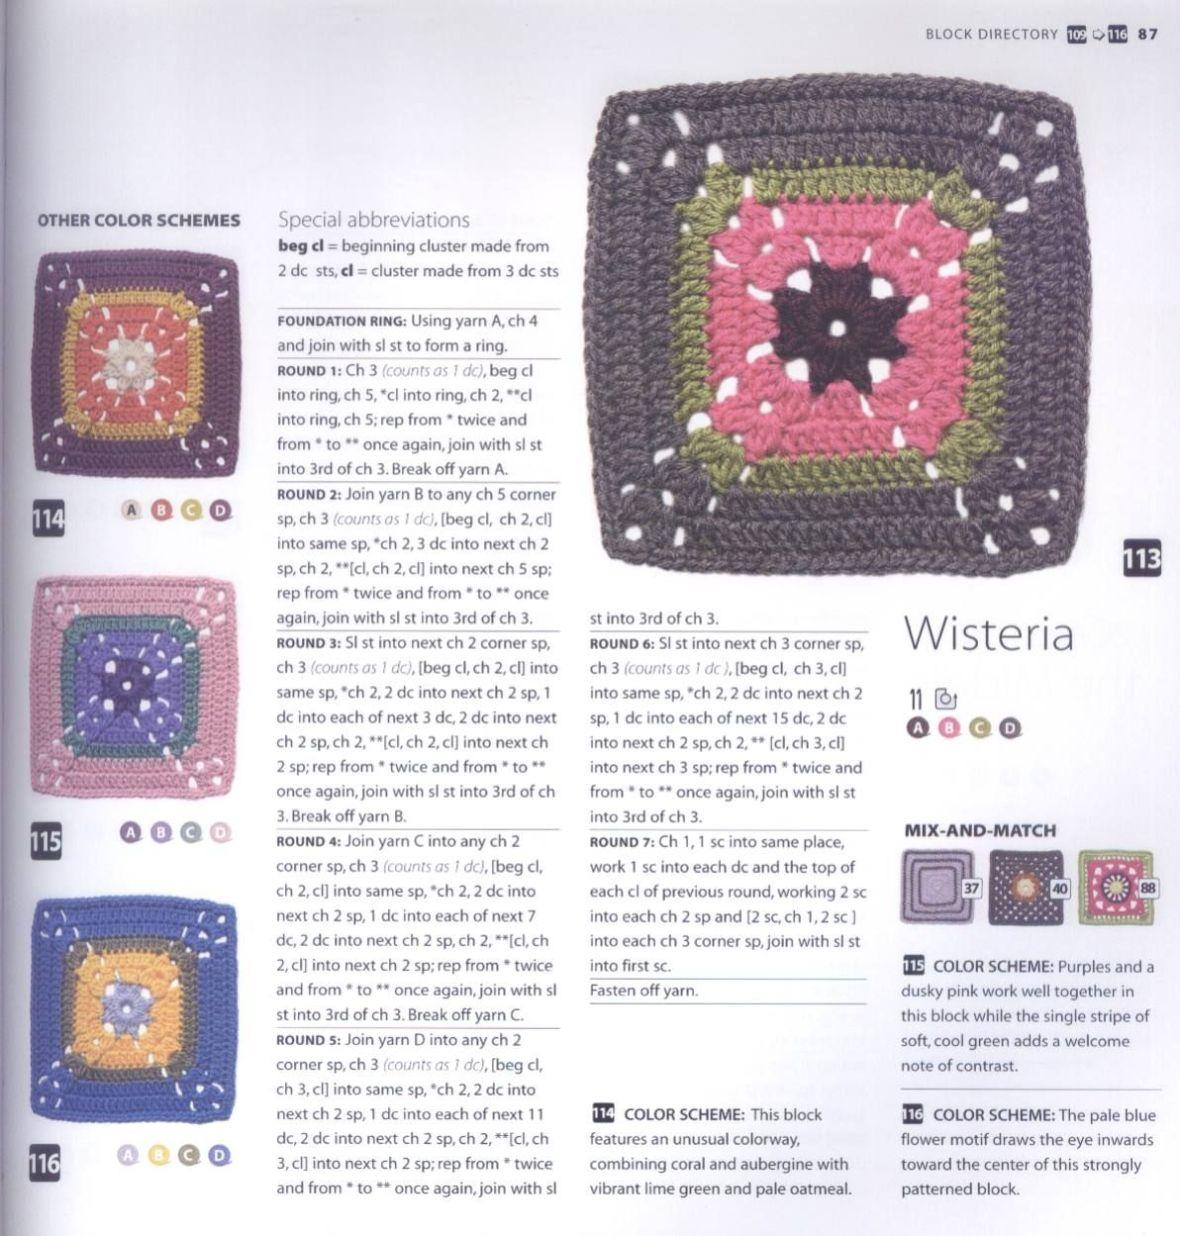 200 Crocheted Blocks for blankets, throws & Afghans 087